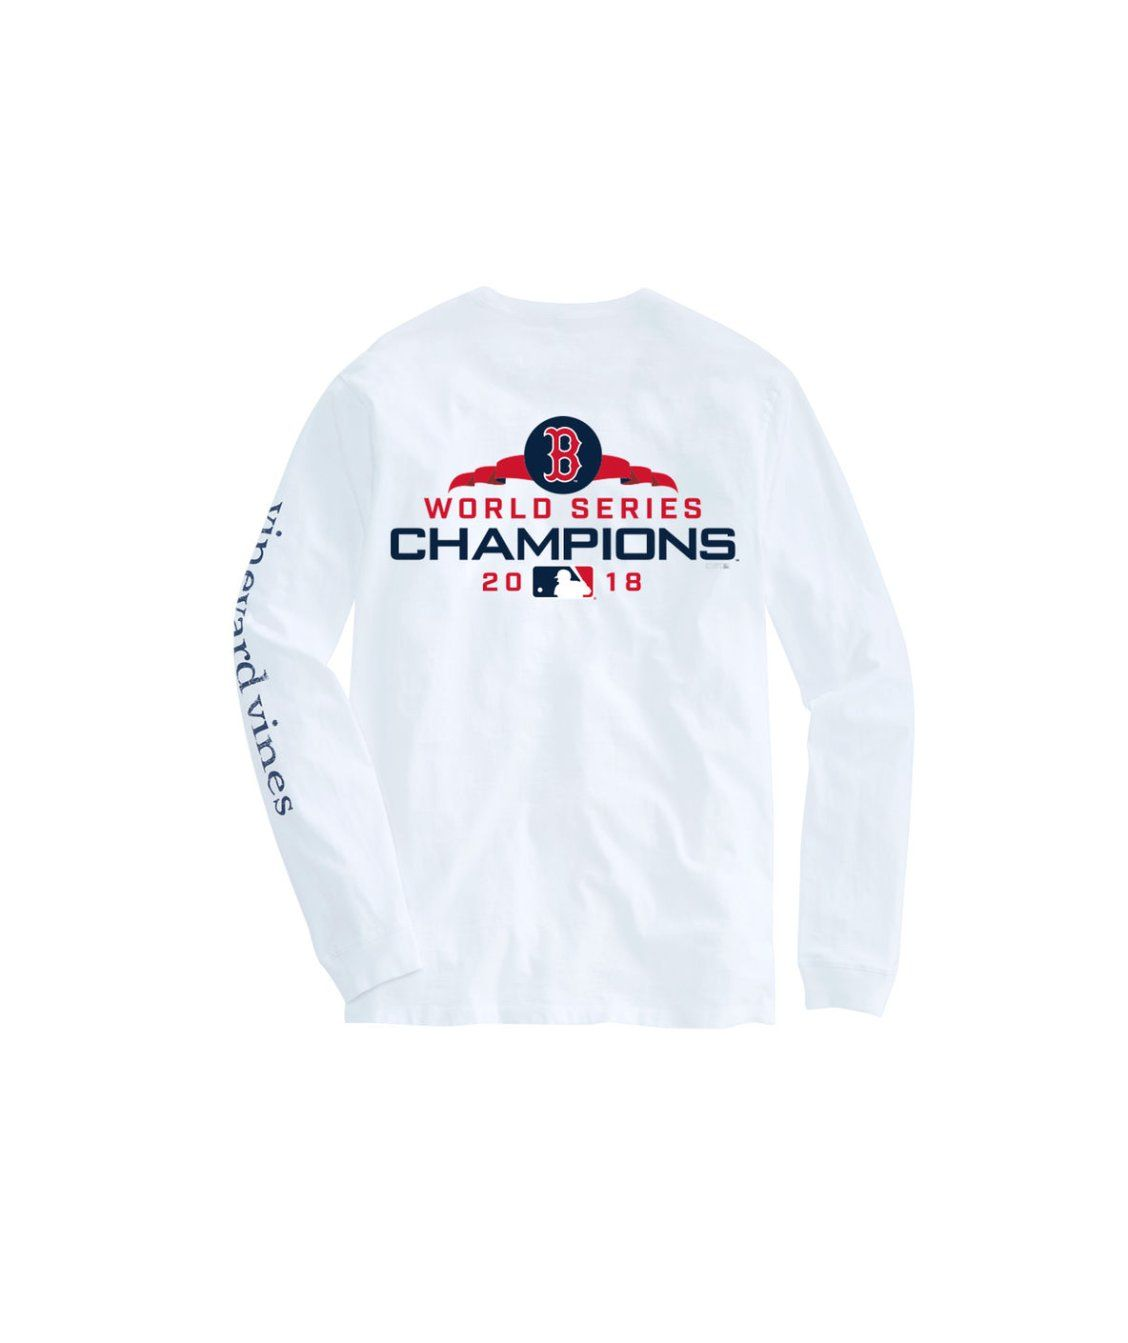 cd7fefdaf Adult Boston Red Sox World Series Champions T-Shirt   new arrivals ...